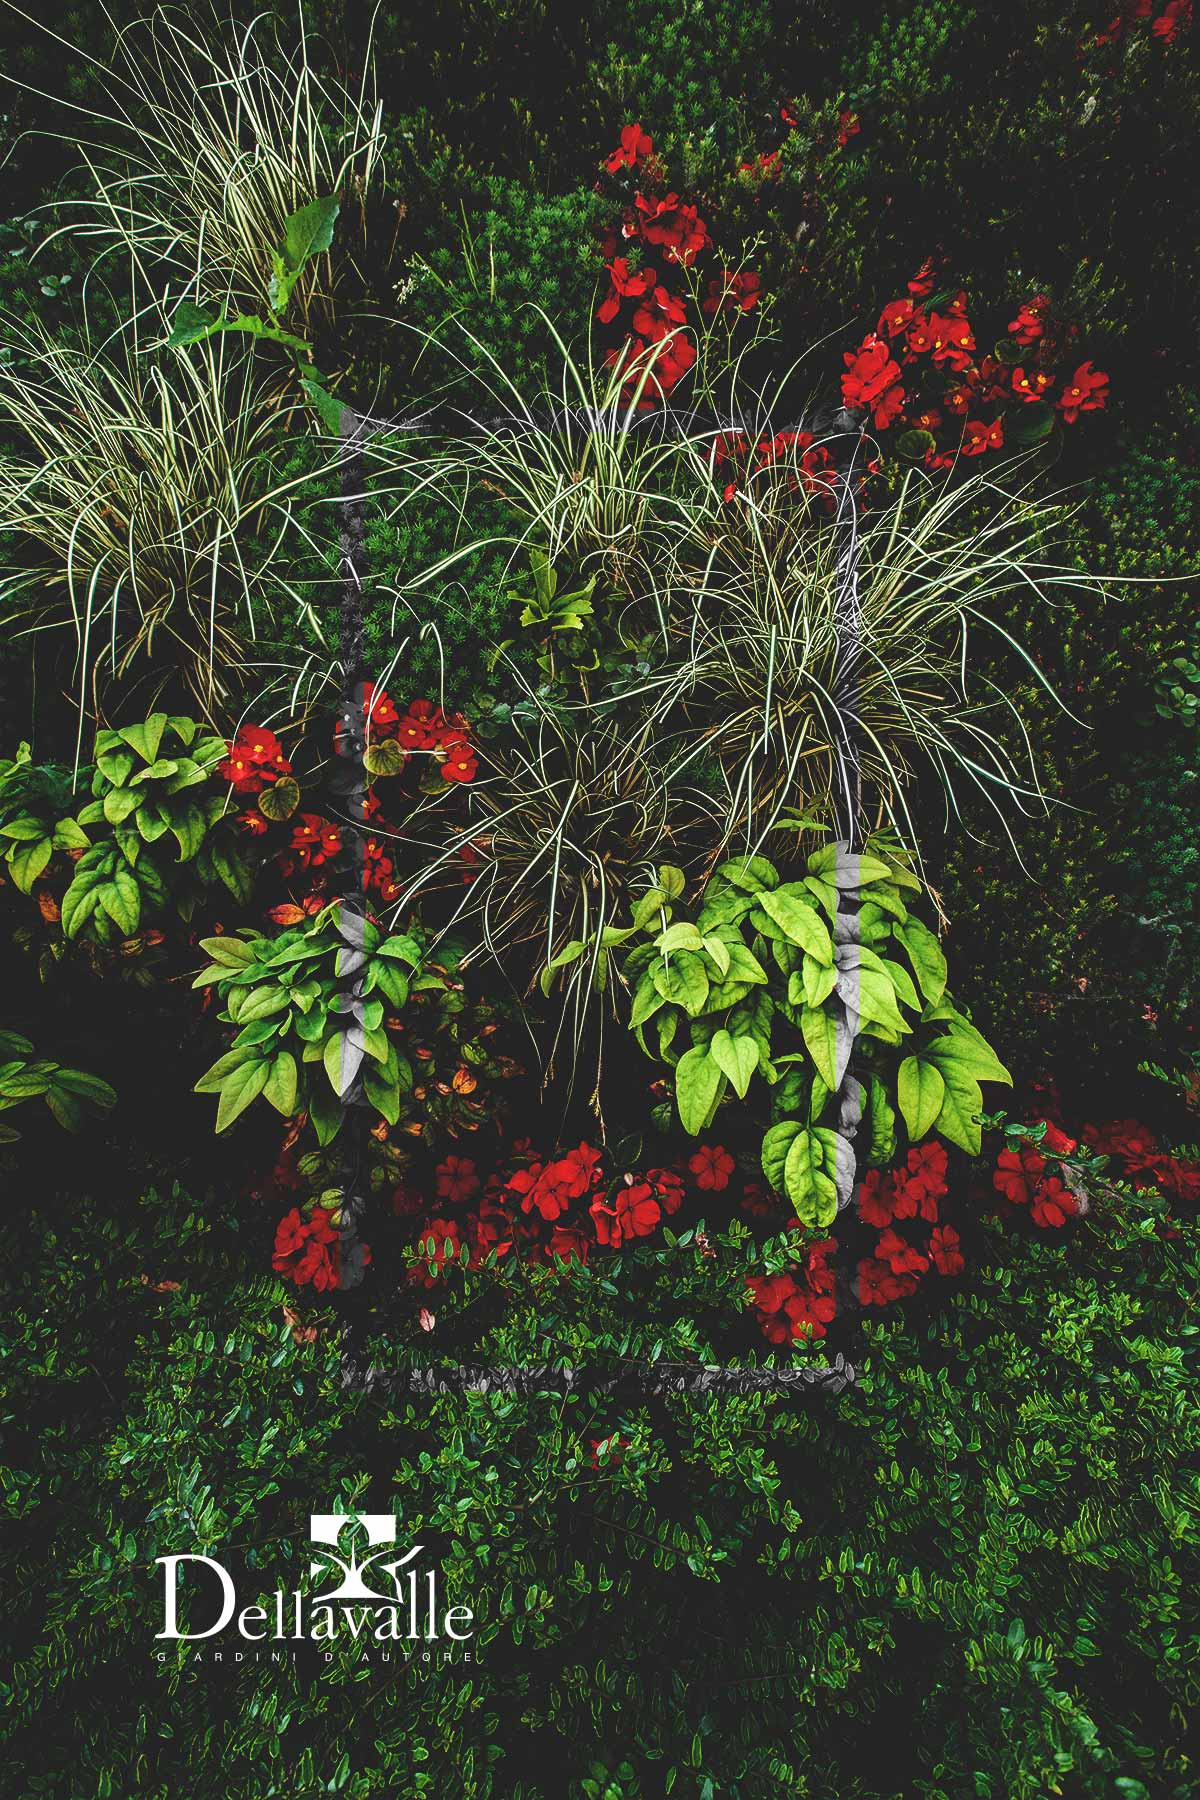 pareti vegetali